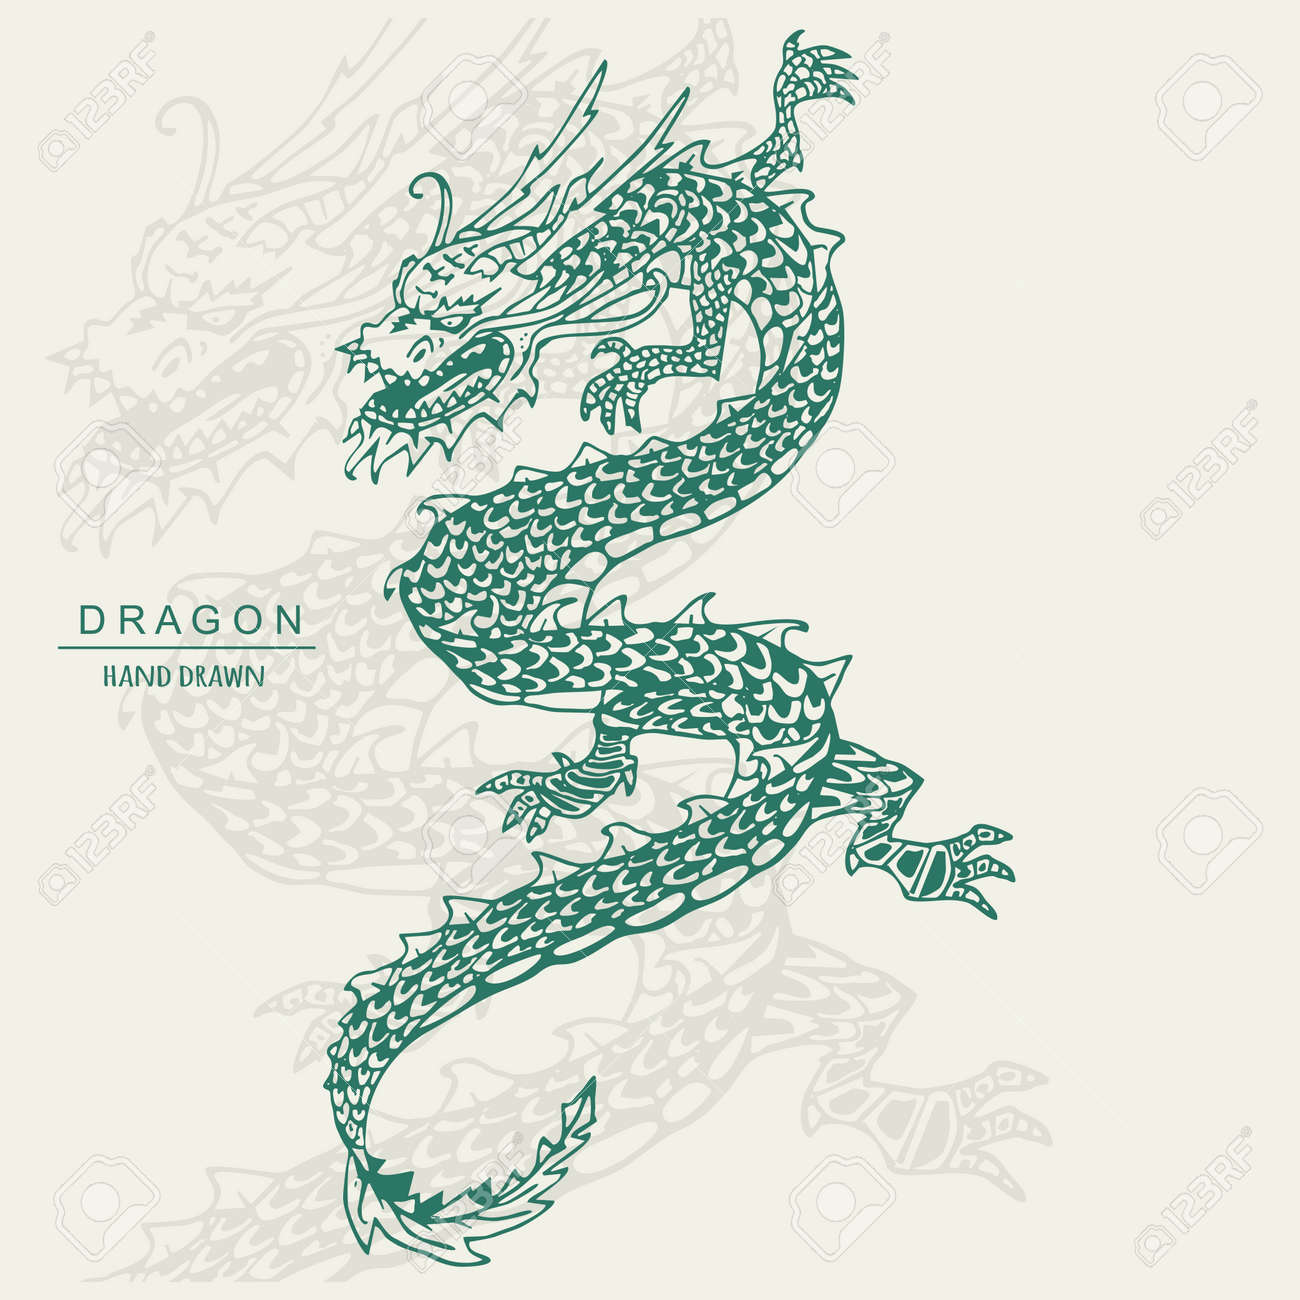 Chinese Dragon Tattoo. Hand draw vector illustration. - 97125324